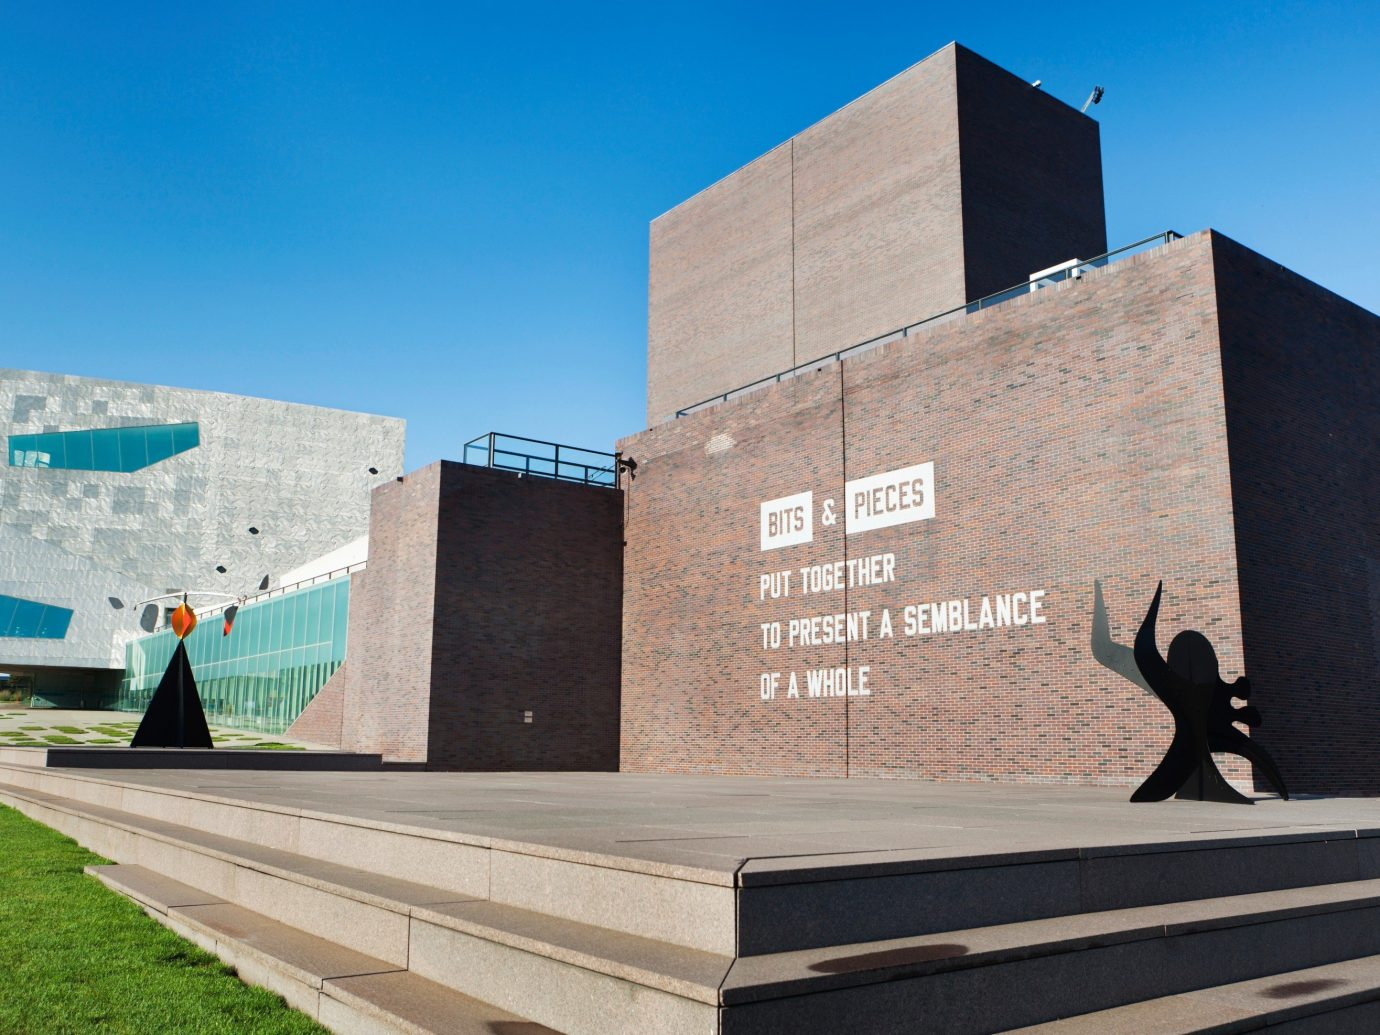 Trip Ideas sky outdoor landmark Architecture facade monument tourist attraction professional concrete